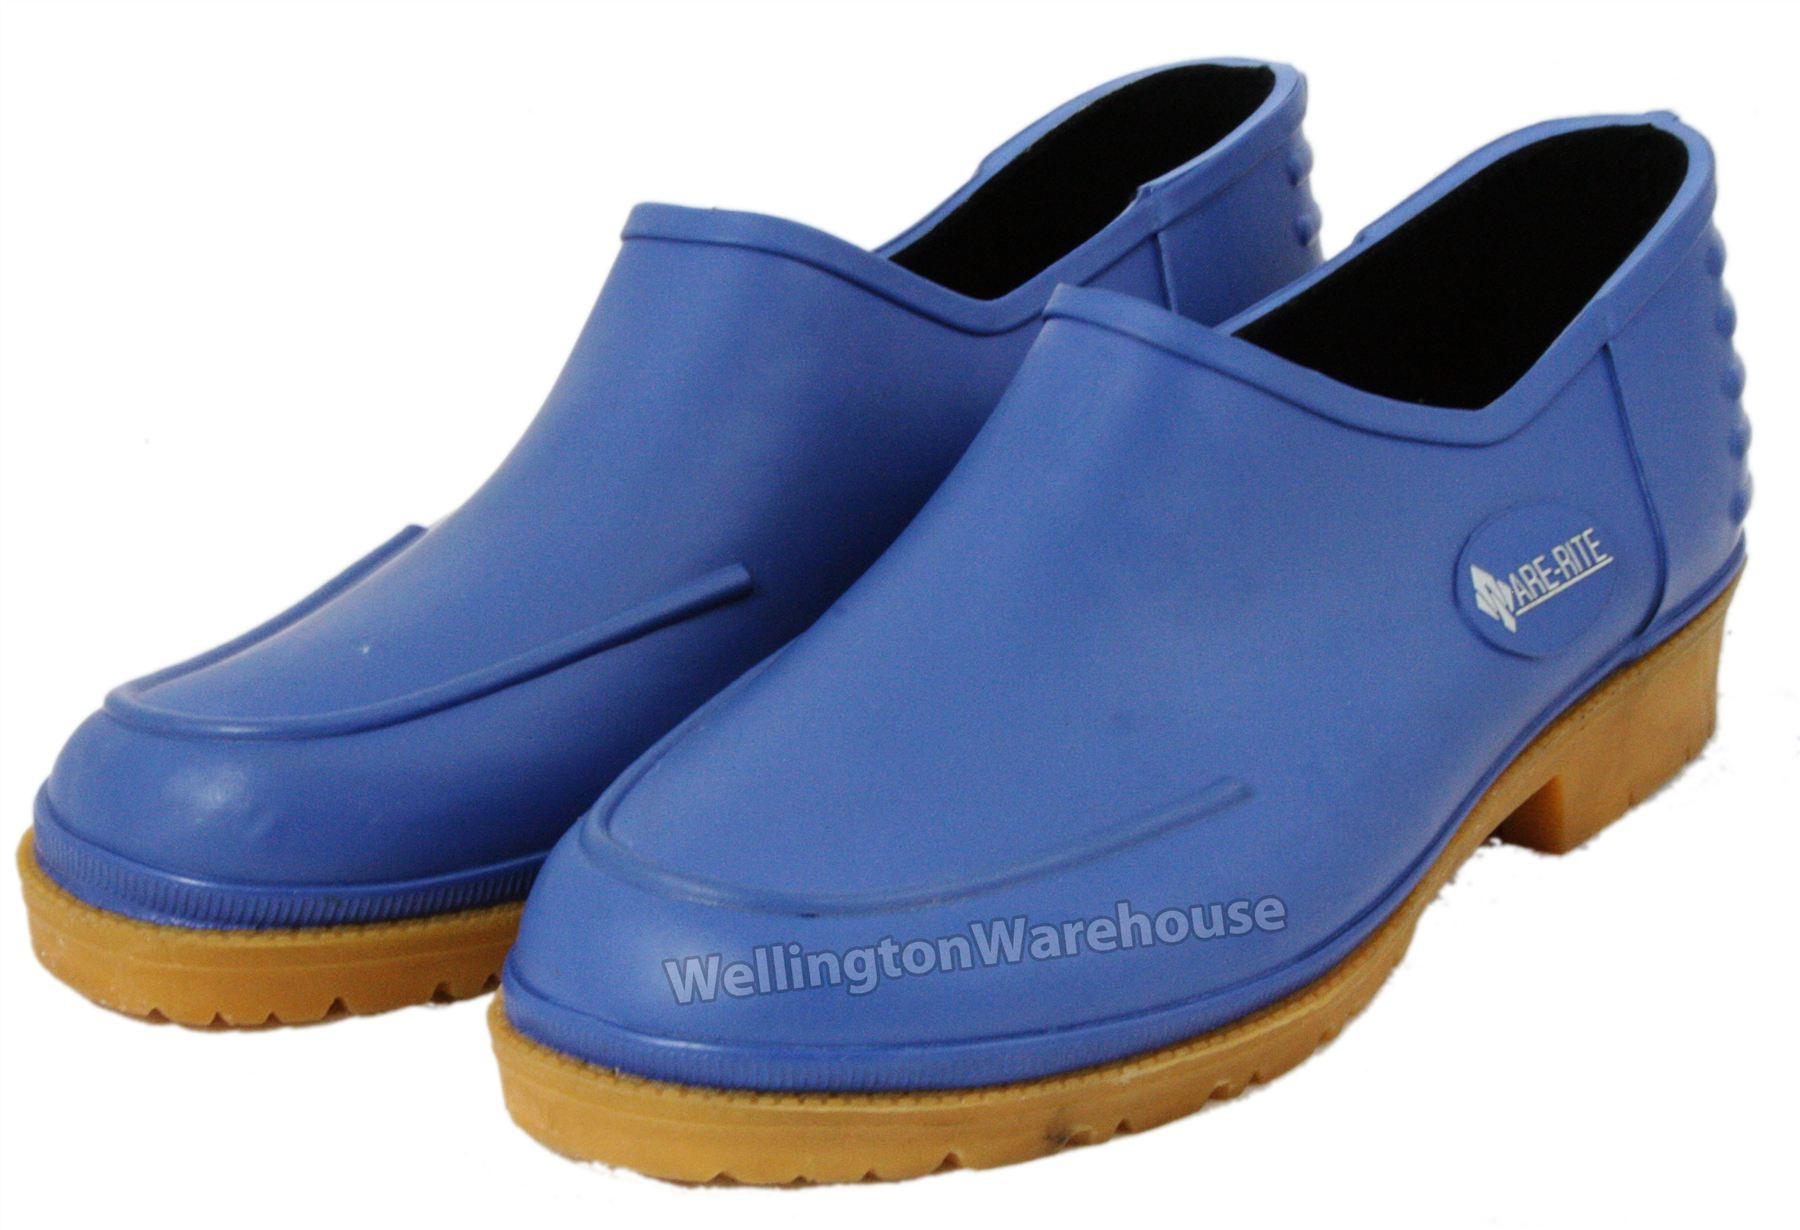 Wonderful Ladies Wellies Winter Boots Green Designer Rubber Wellingtons Evercreatures | EBay